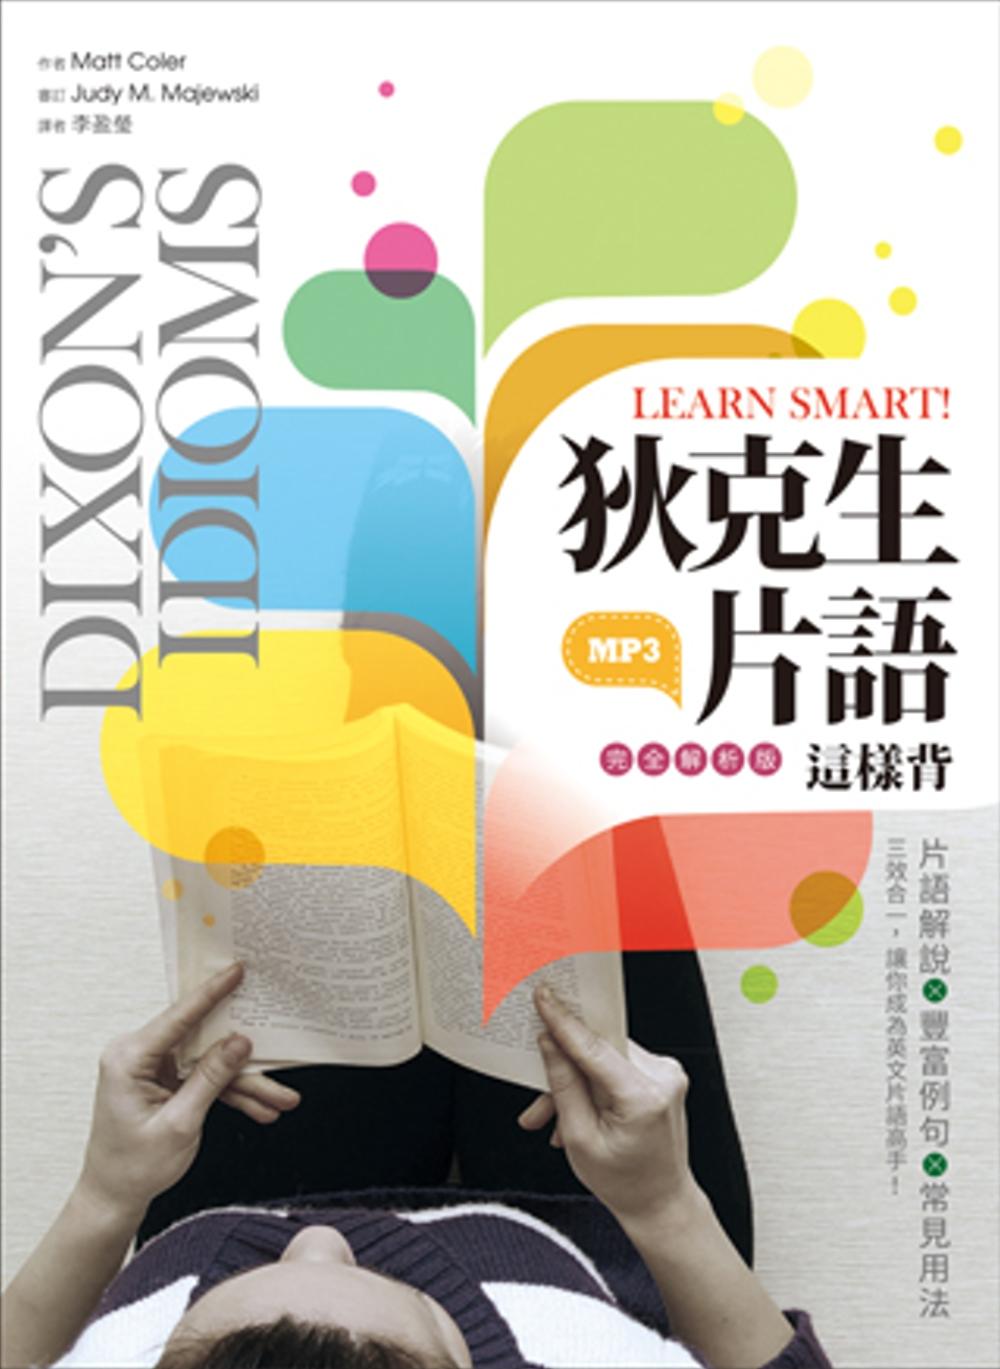 Learn Smart!狄克生片語這樣背【完全解析版】(32K彩色+1MP3)